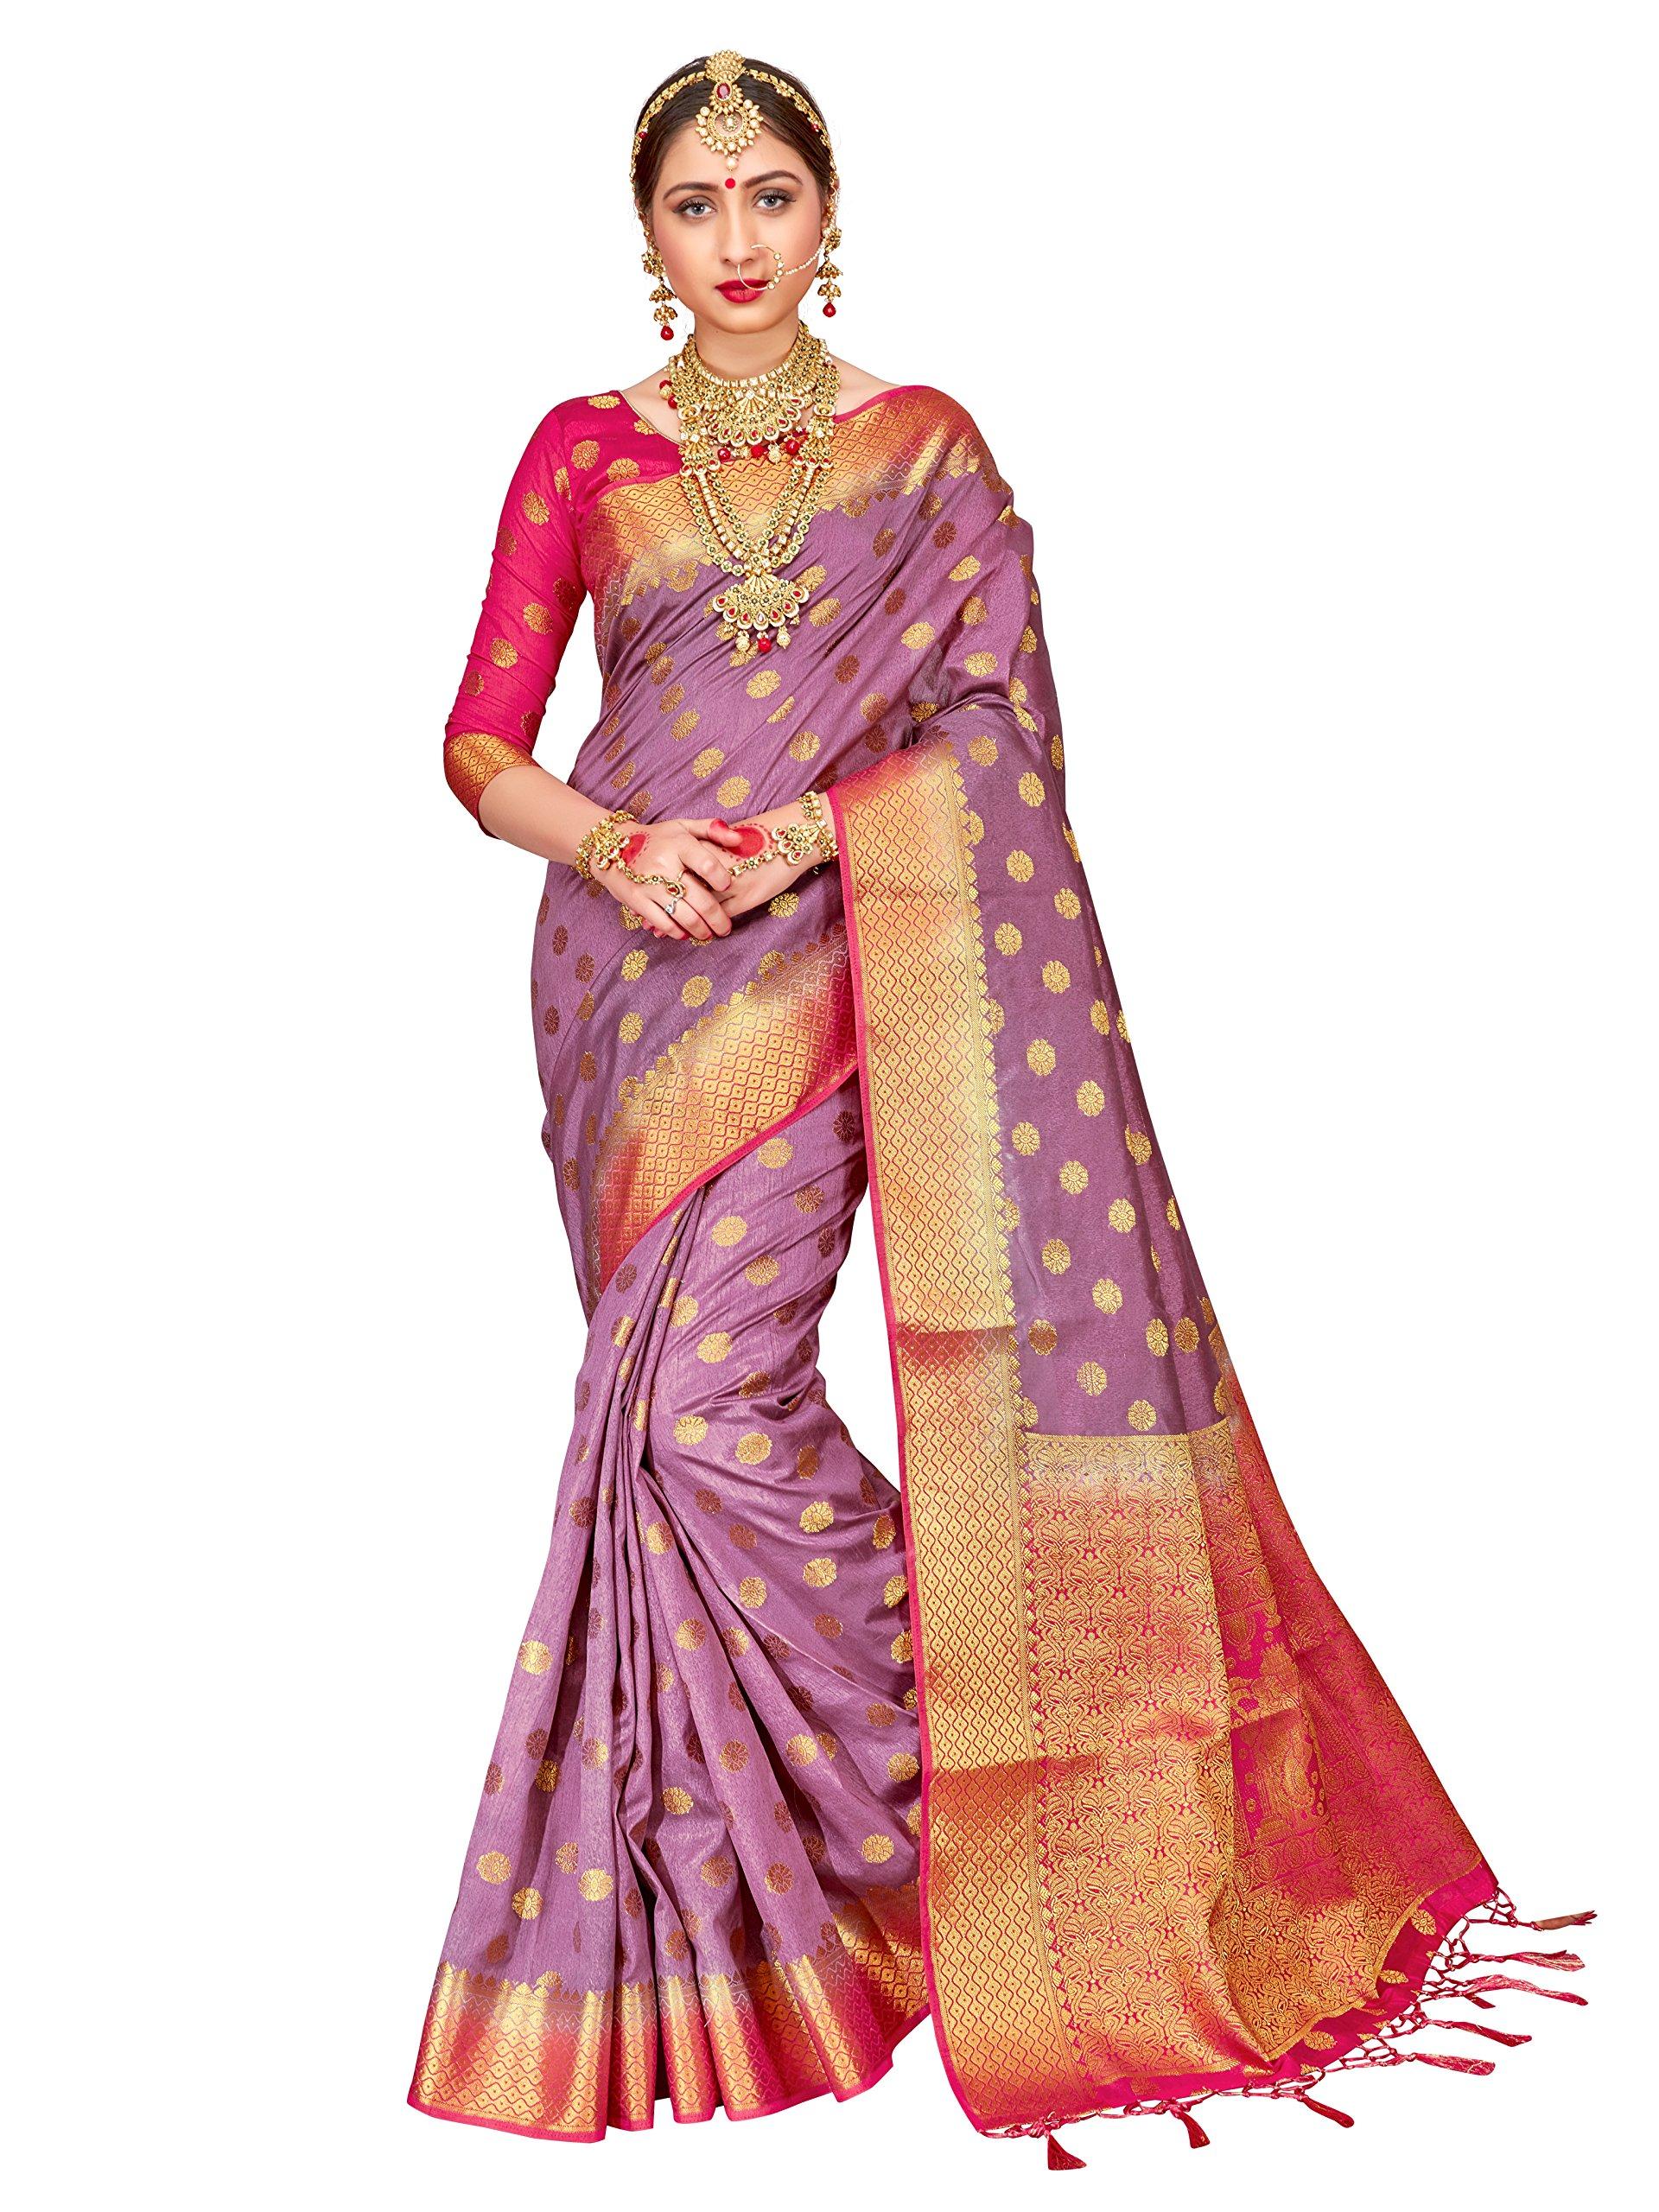 ELINA FASHION Sarees for Women Banarasi Art Silk Woven Work Saree l Indian Wedding Ethnic Wear Sari & Blouse Piece (Violet)